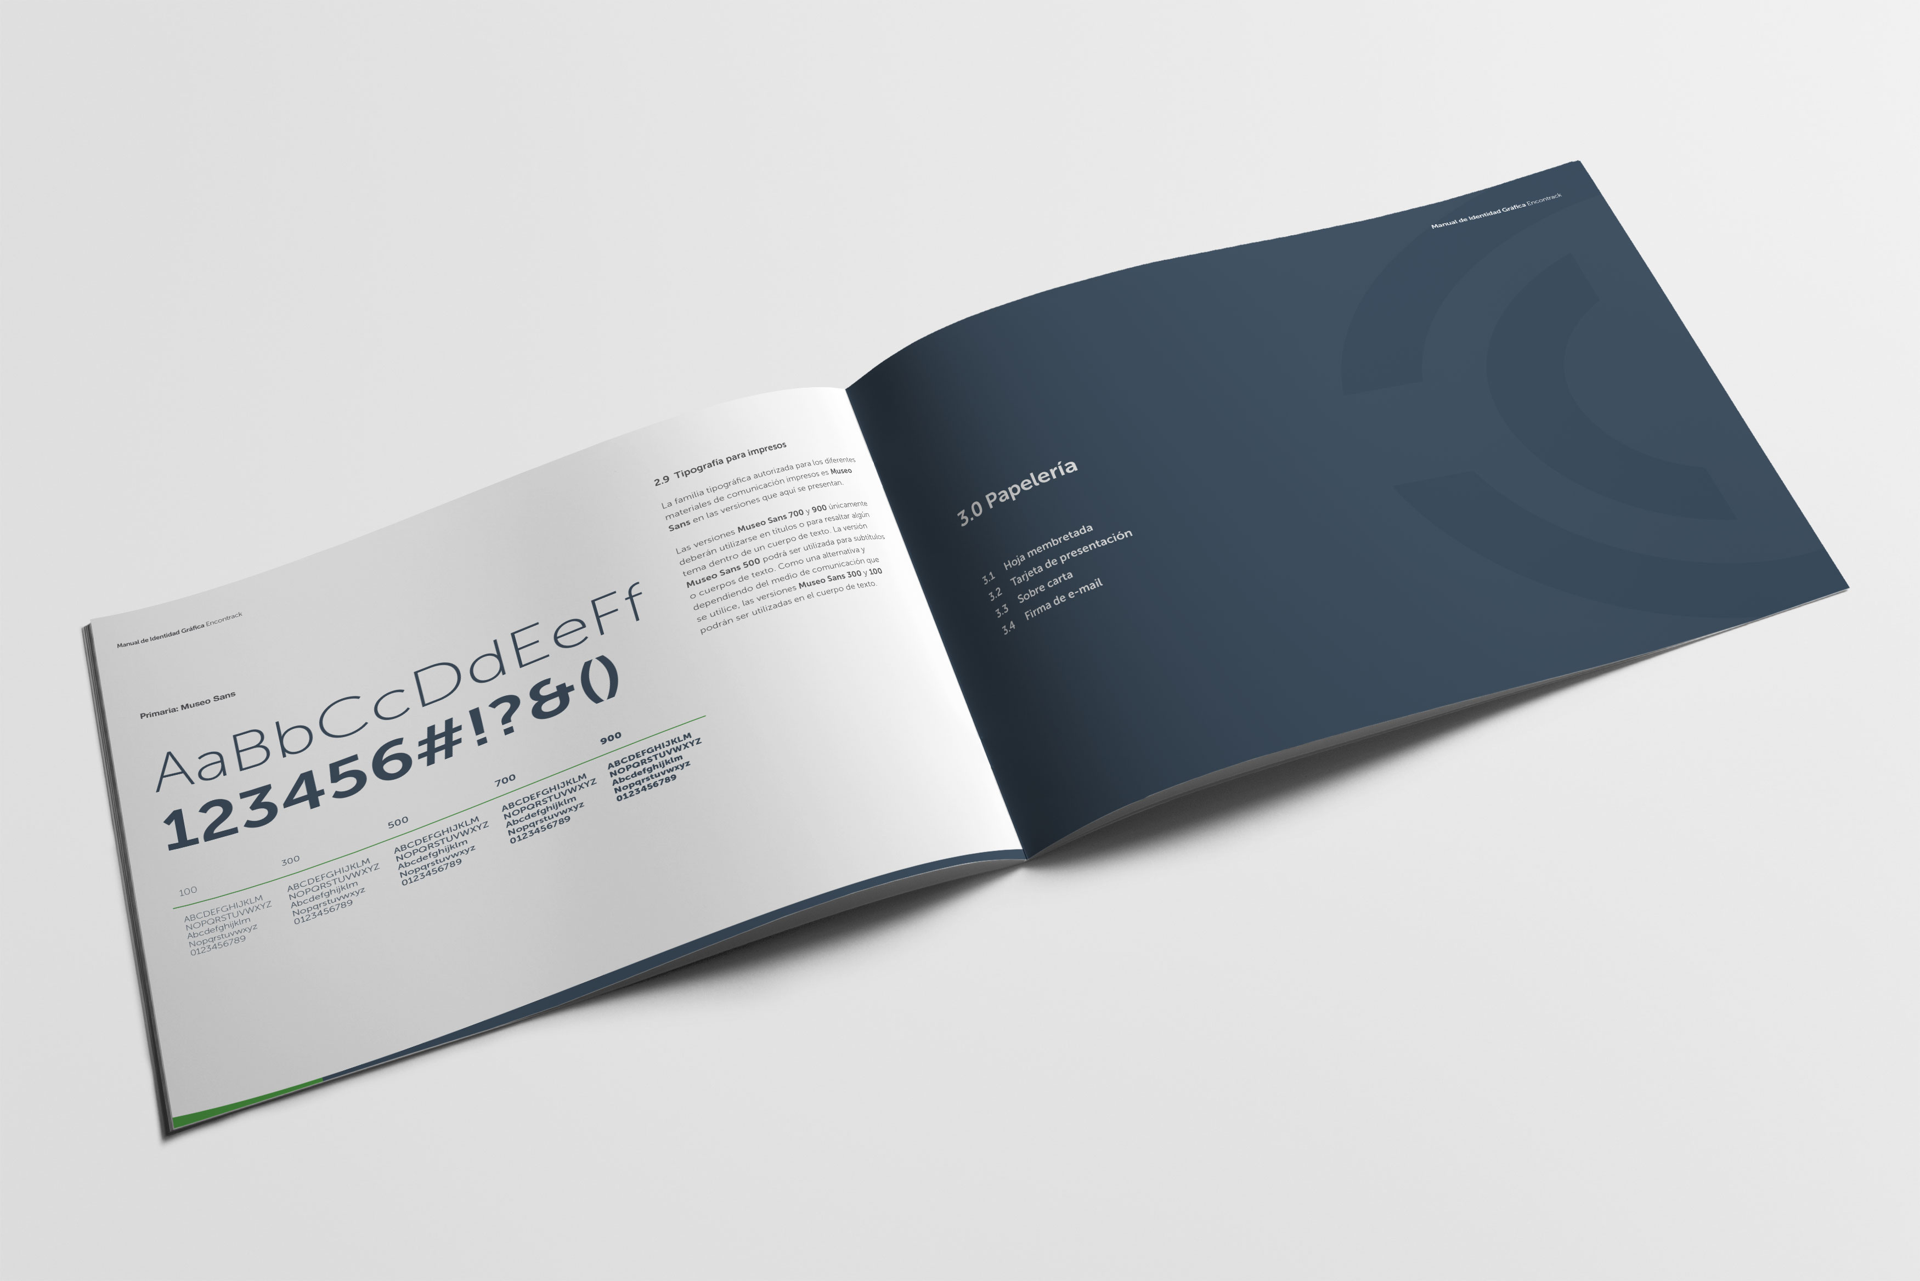 06-manual-encontrack